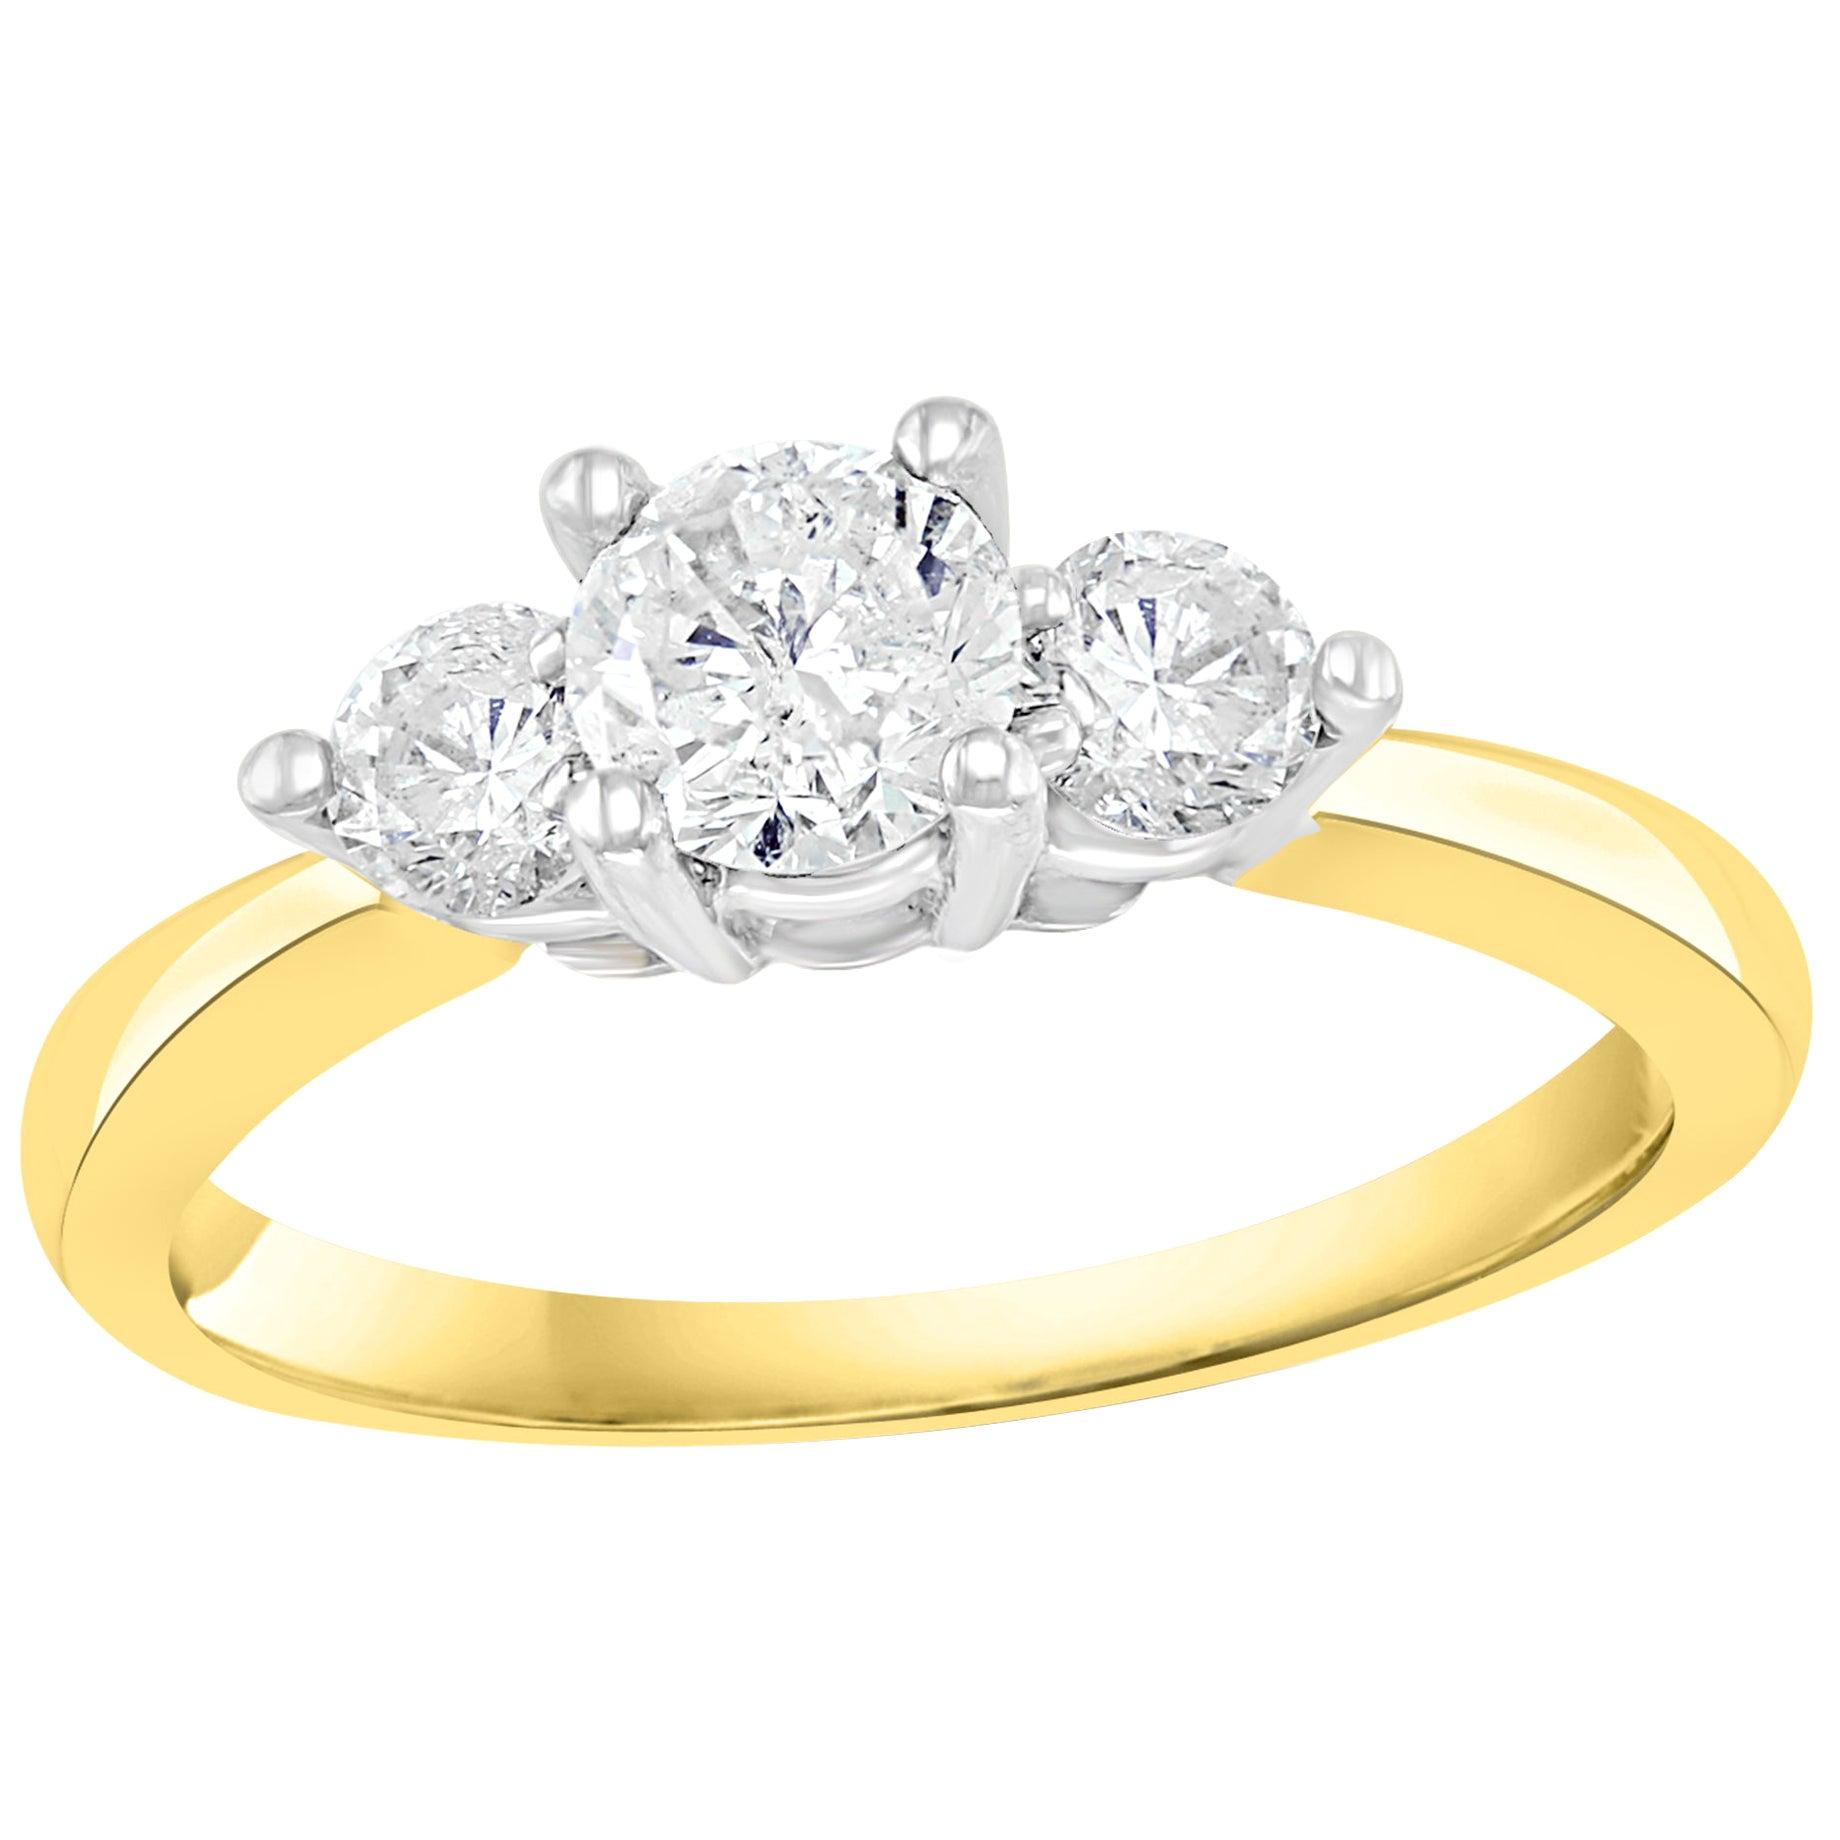 Three-Stone Diamond 1.0 Carat Traditional Ring/Band 14 Karat Yellow Gold